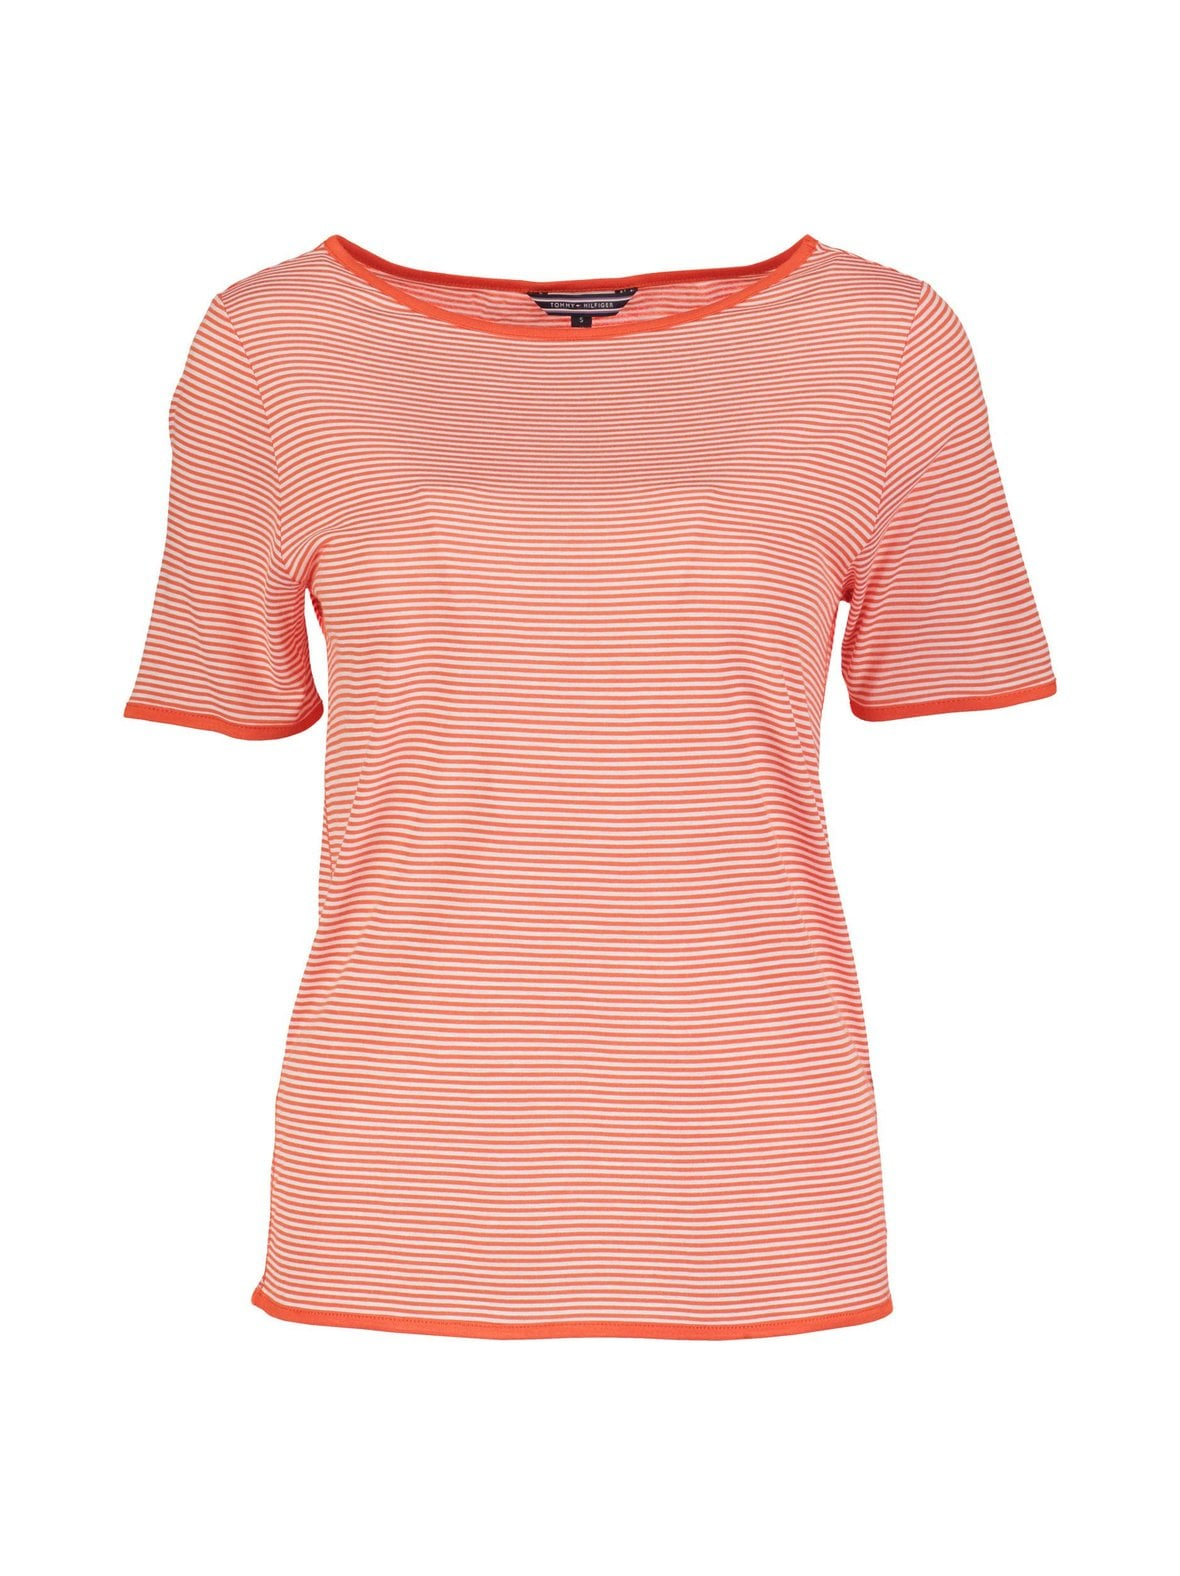 Fiesta (oranssi   valkoinen) Tommy Hilfiger Daisy-paita  440e2a22e9